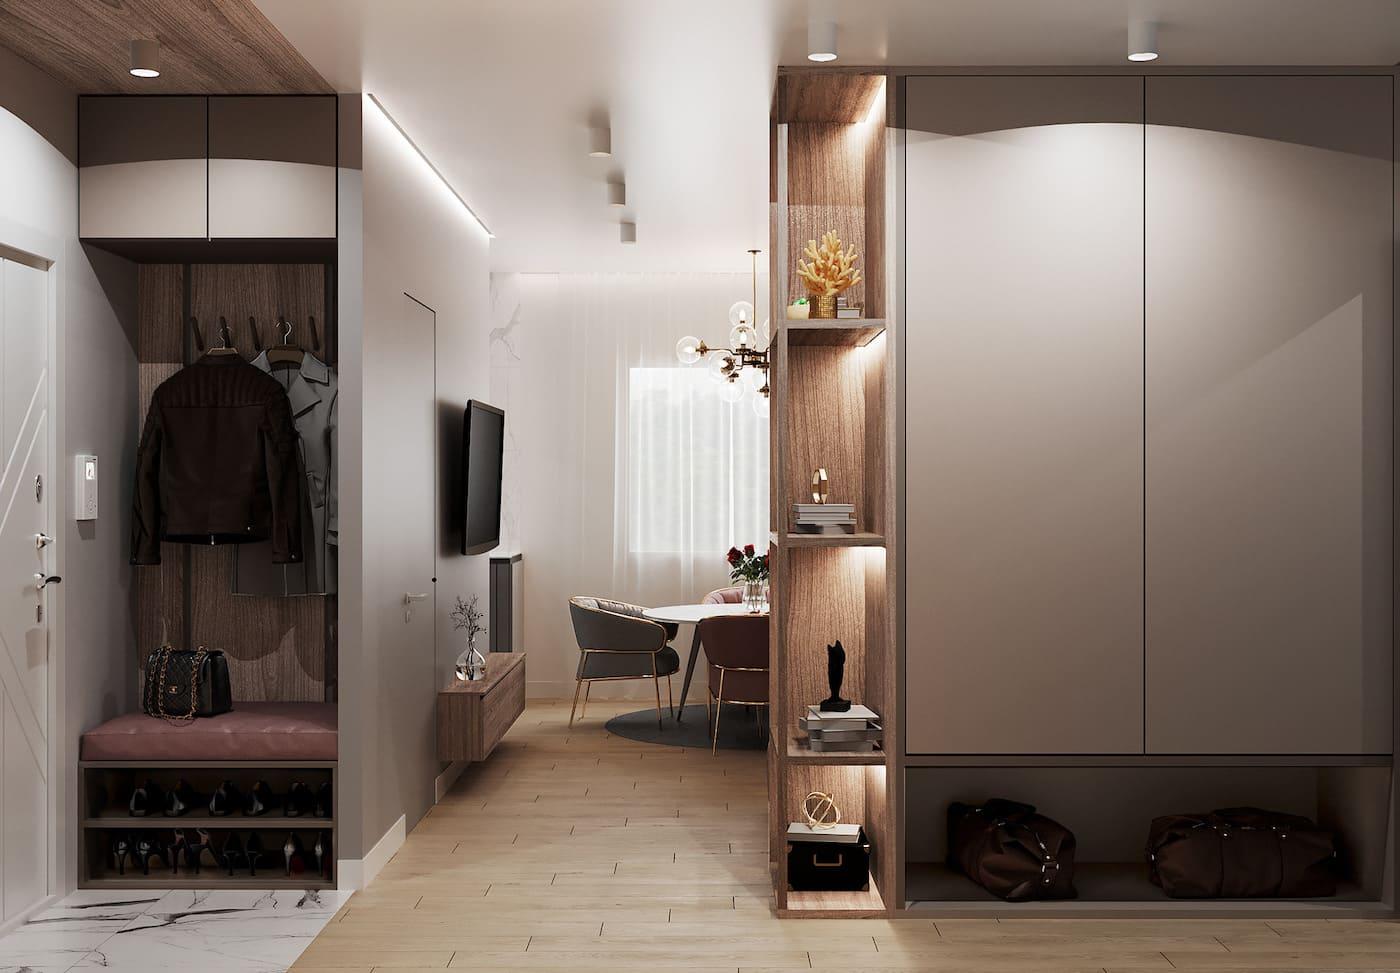 дизайн интерьера модной квартиры фото 97